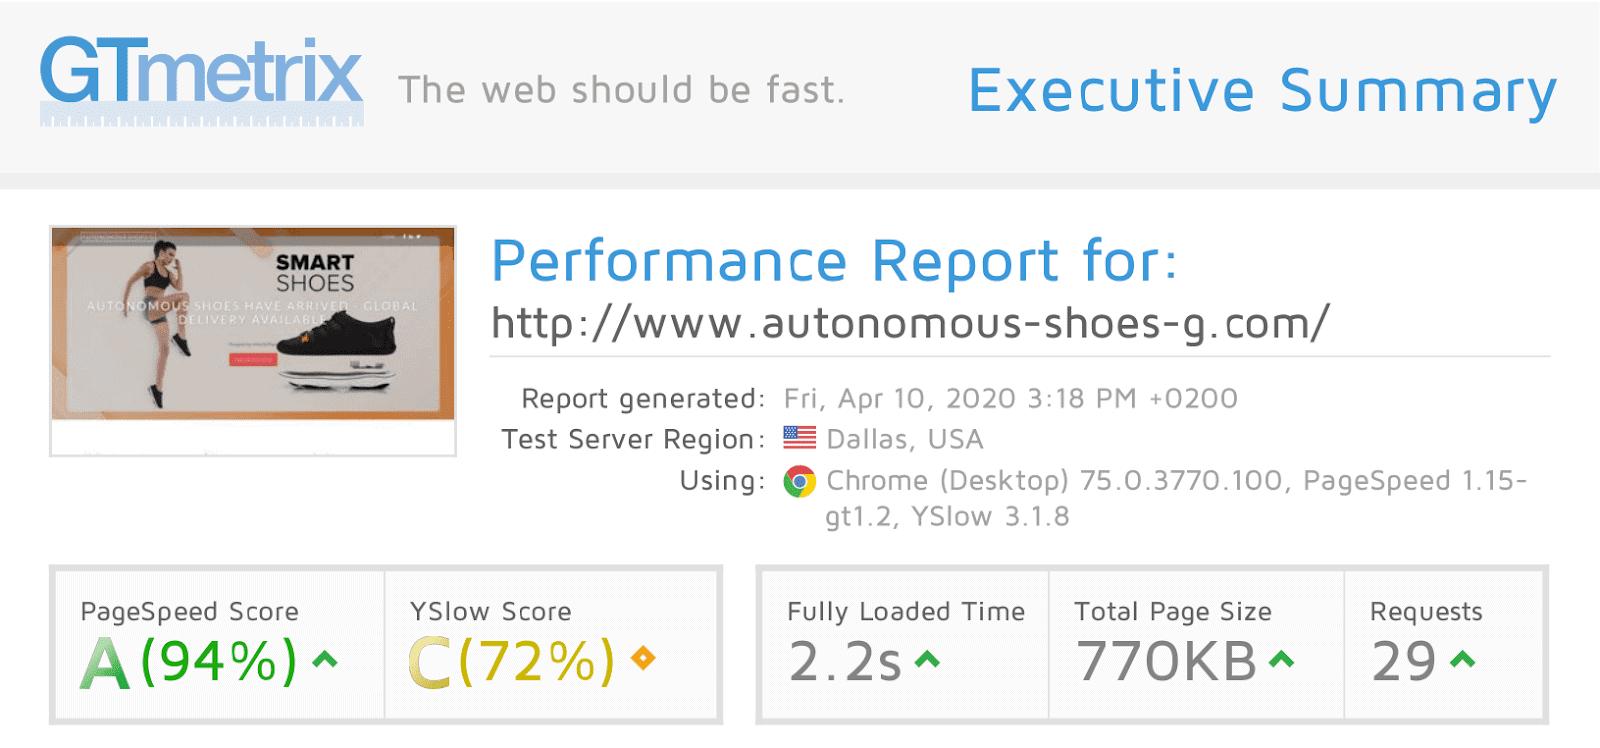 GoDaddy's GTmetrix results